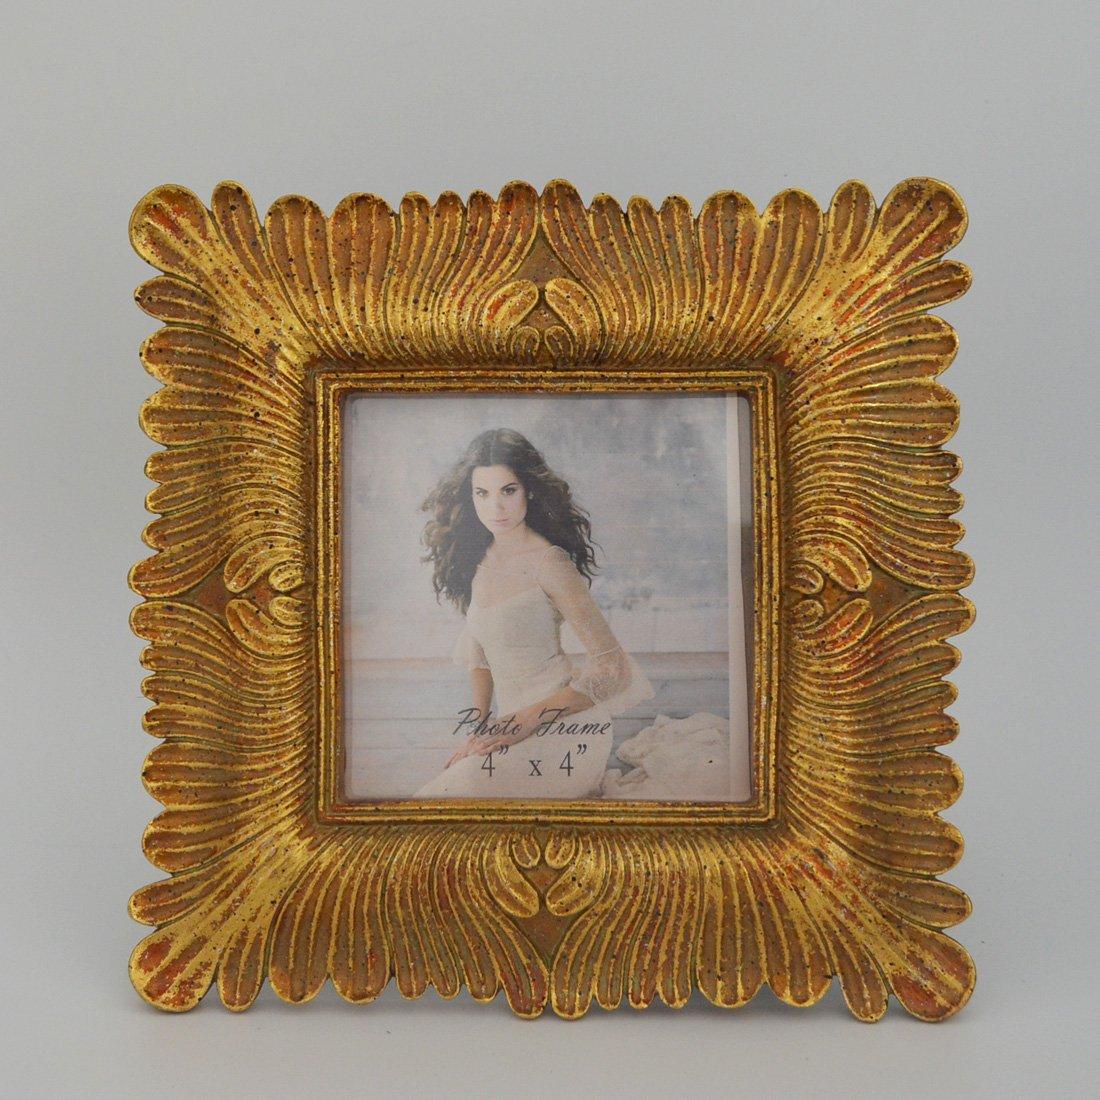 Amazon.de: Giftgarden Bilderrahmen gold Vintage quadratisch klein ...